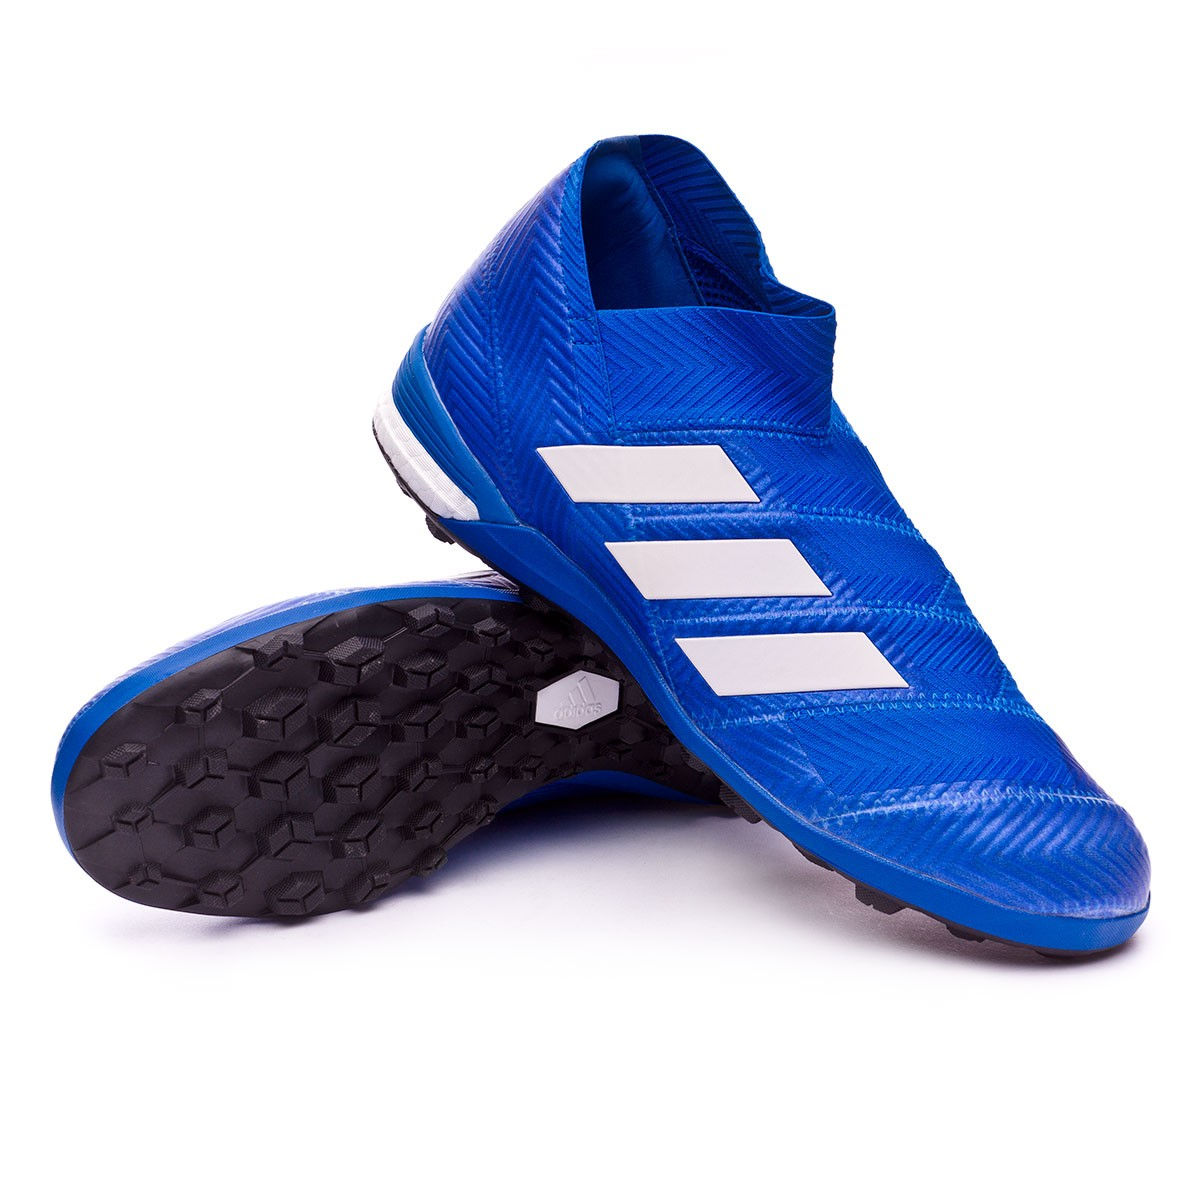 4e8aece1d2b7 Football Boot adidas Nemeziz Tango 18+ Turf Football blue-White ...